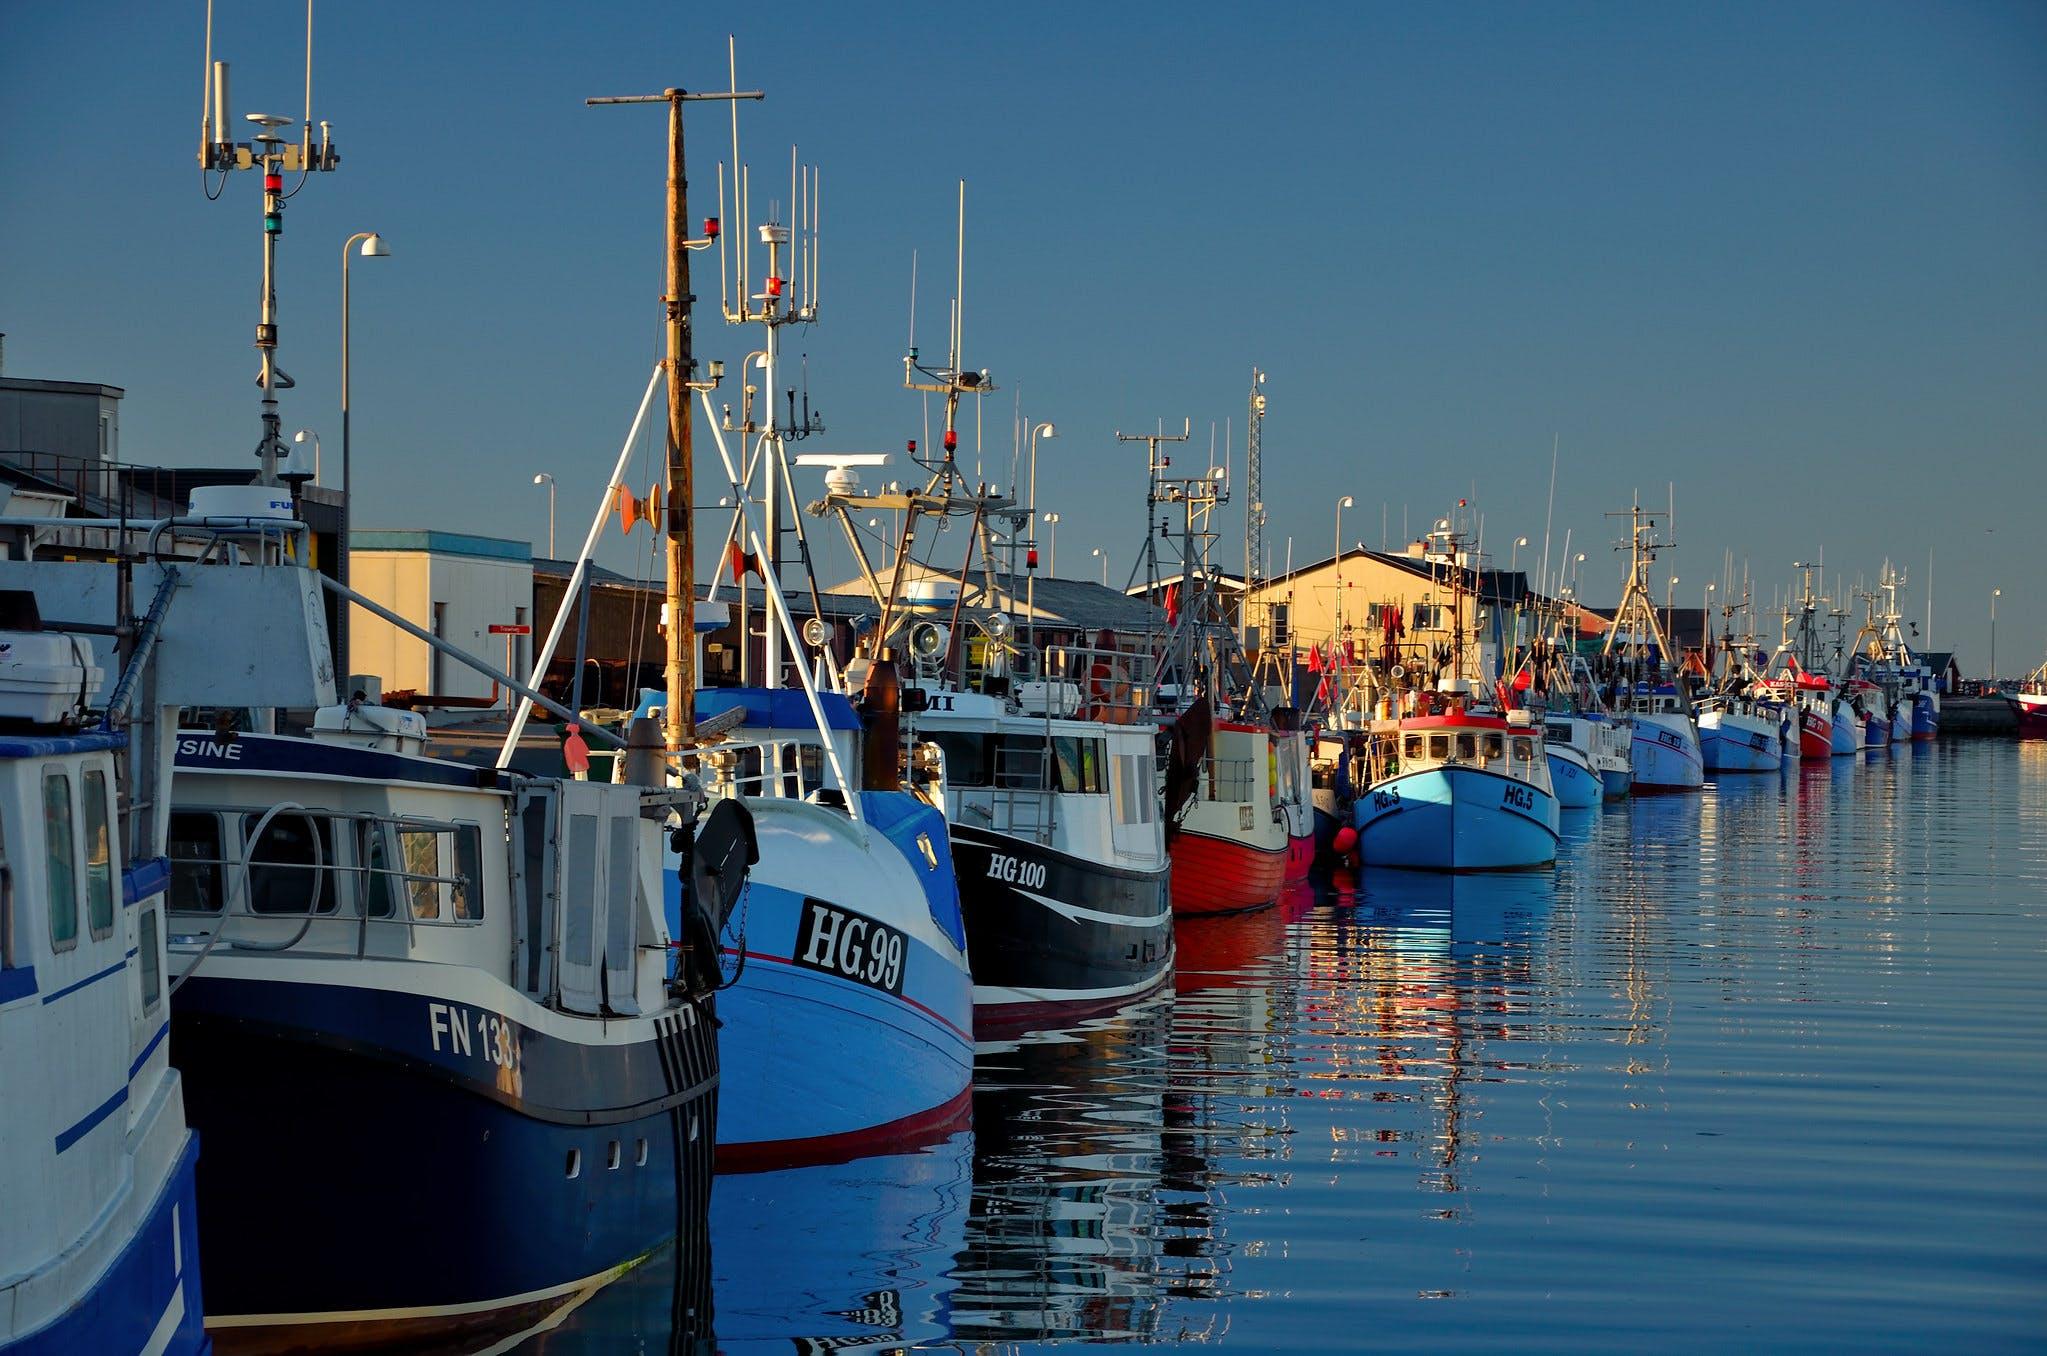 Havnen i Hirtshals. Foto: CCBY Massimo Frasson